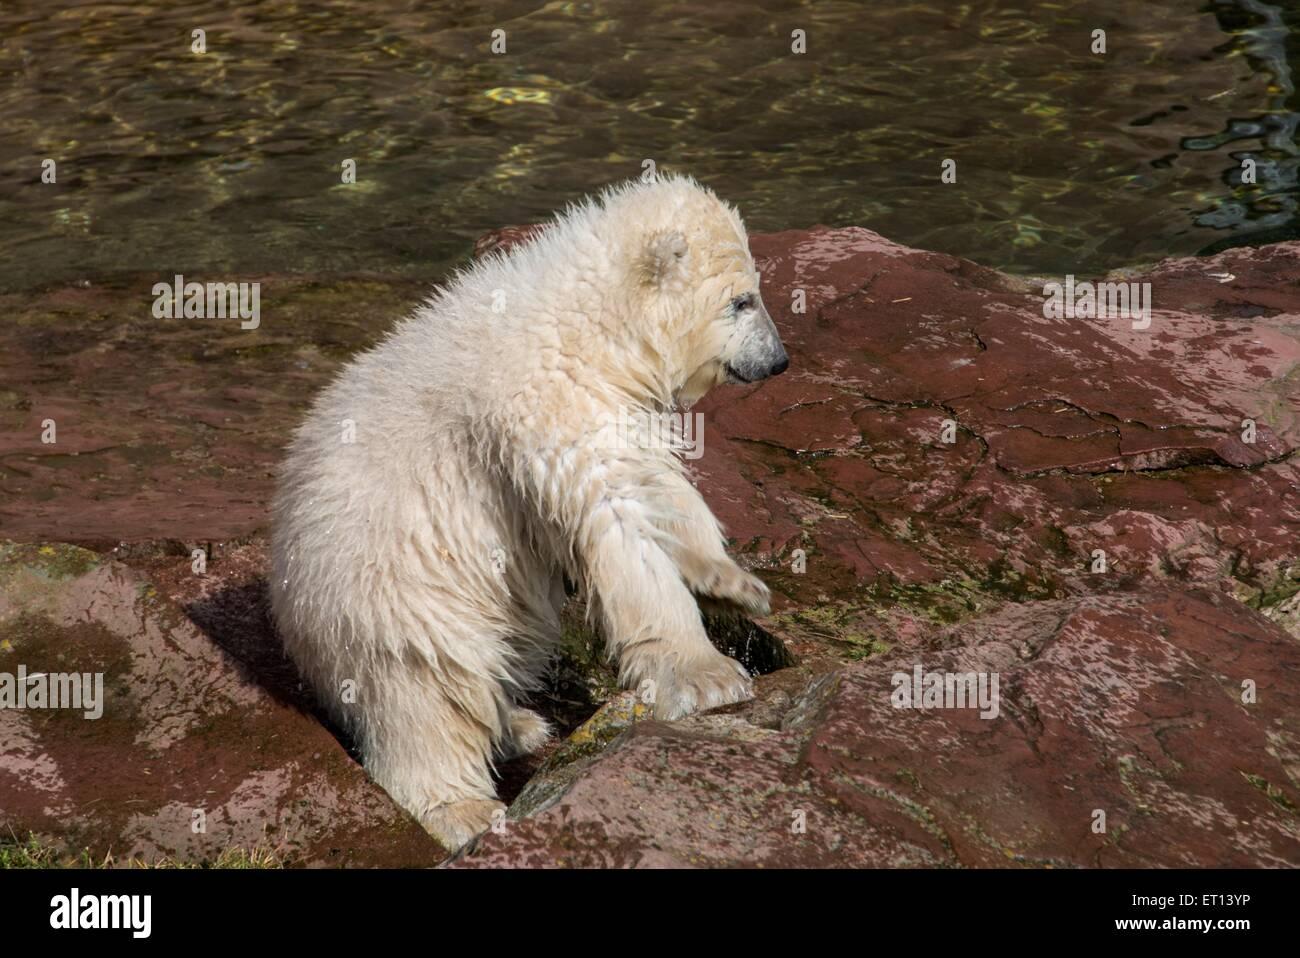 Polar bear on rocks in a zoo - Stock Image